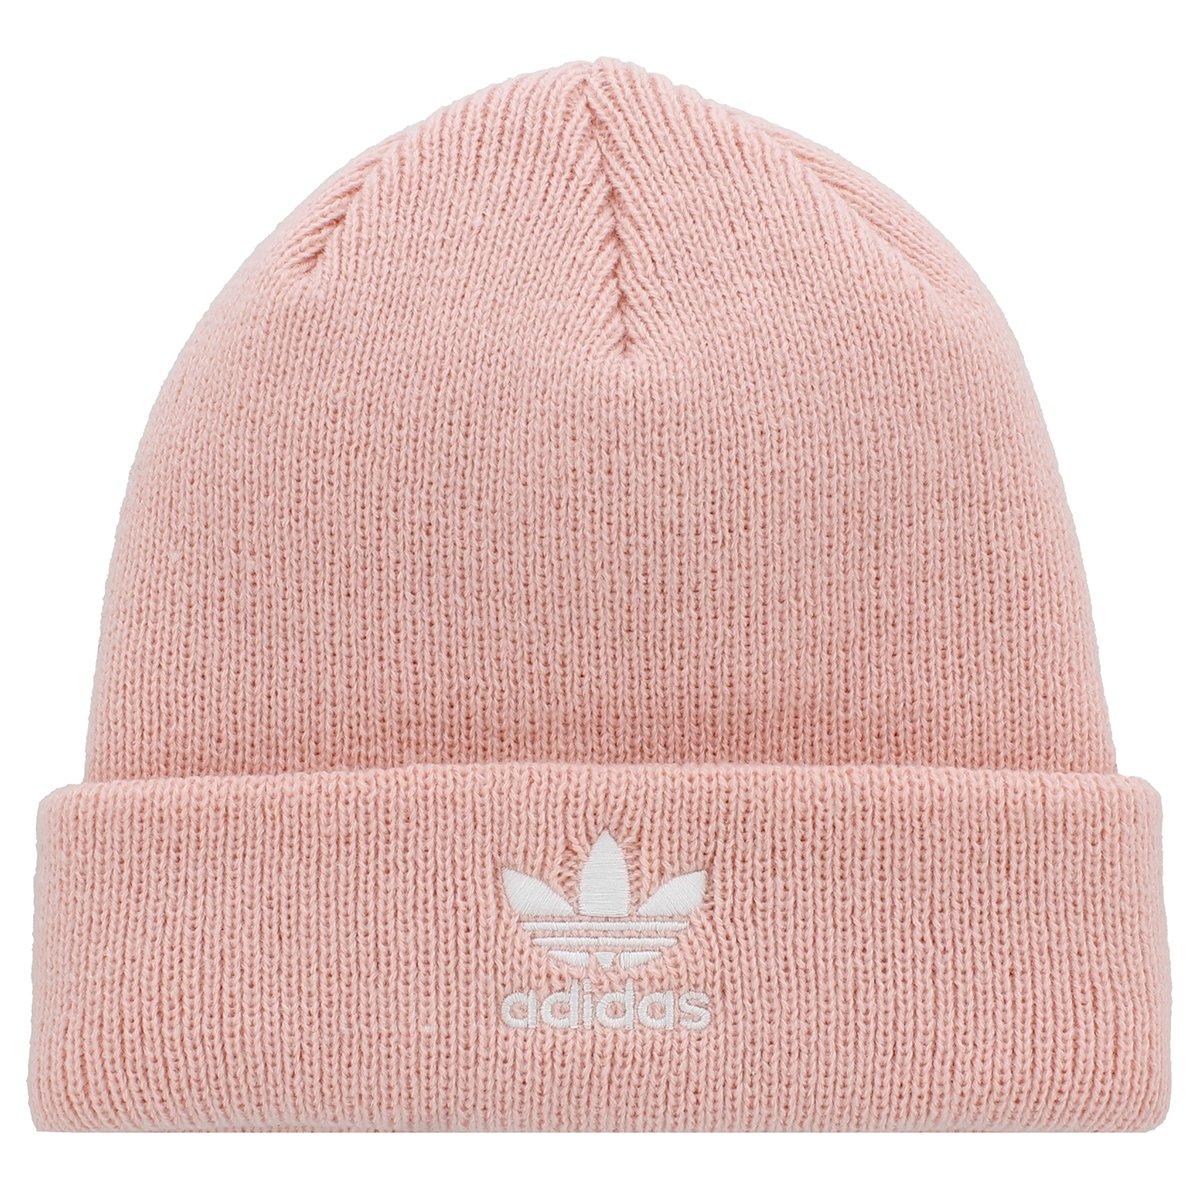 Adidas Womens Originals Trefoil Ii Knit Beanie 716106833465  6c5e4bb877b